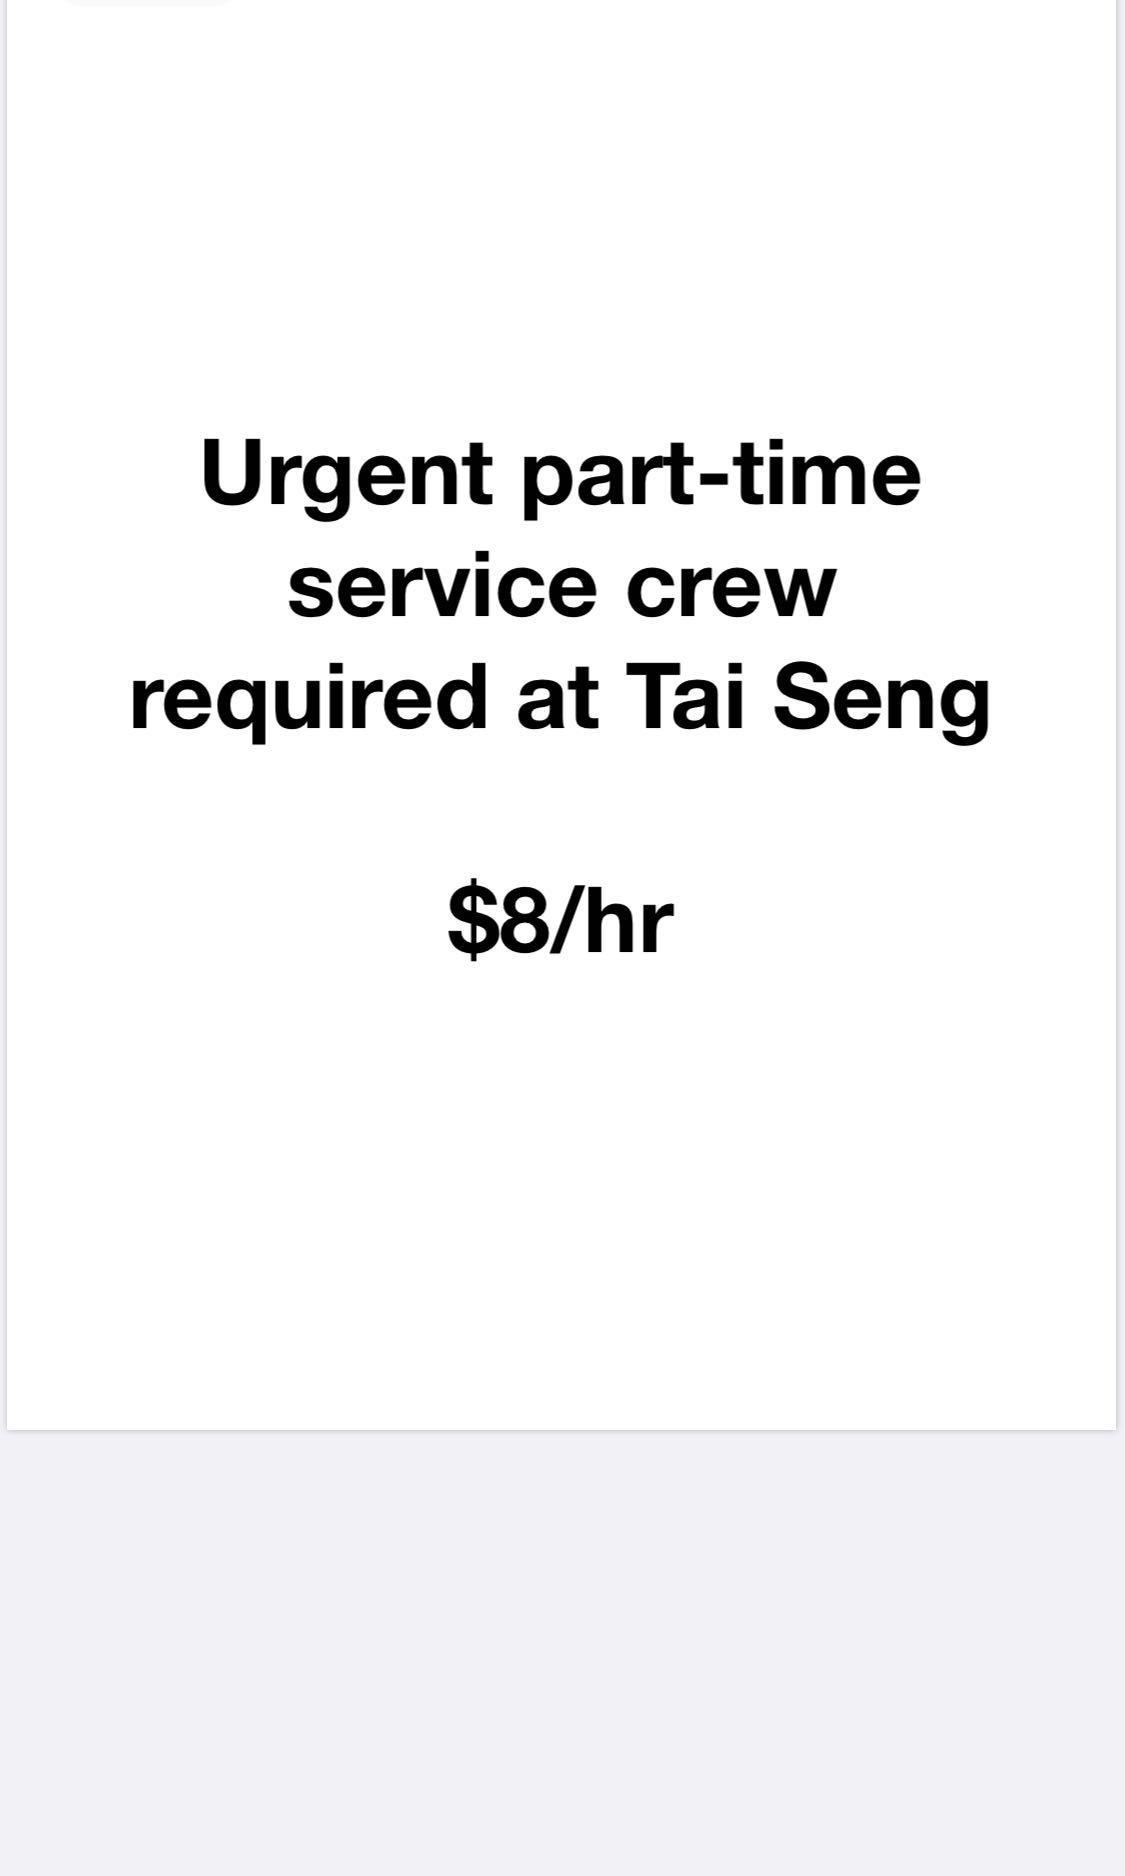 Part-time service crew